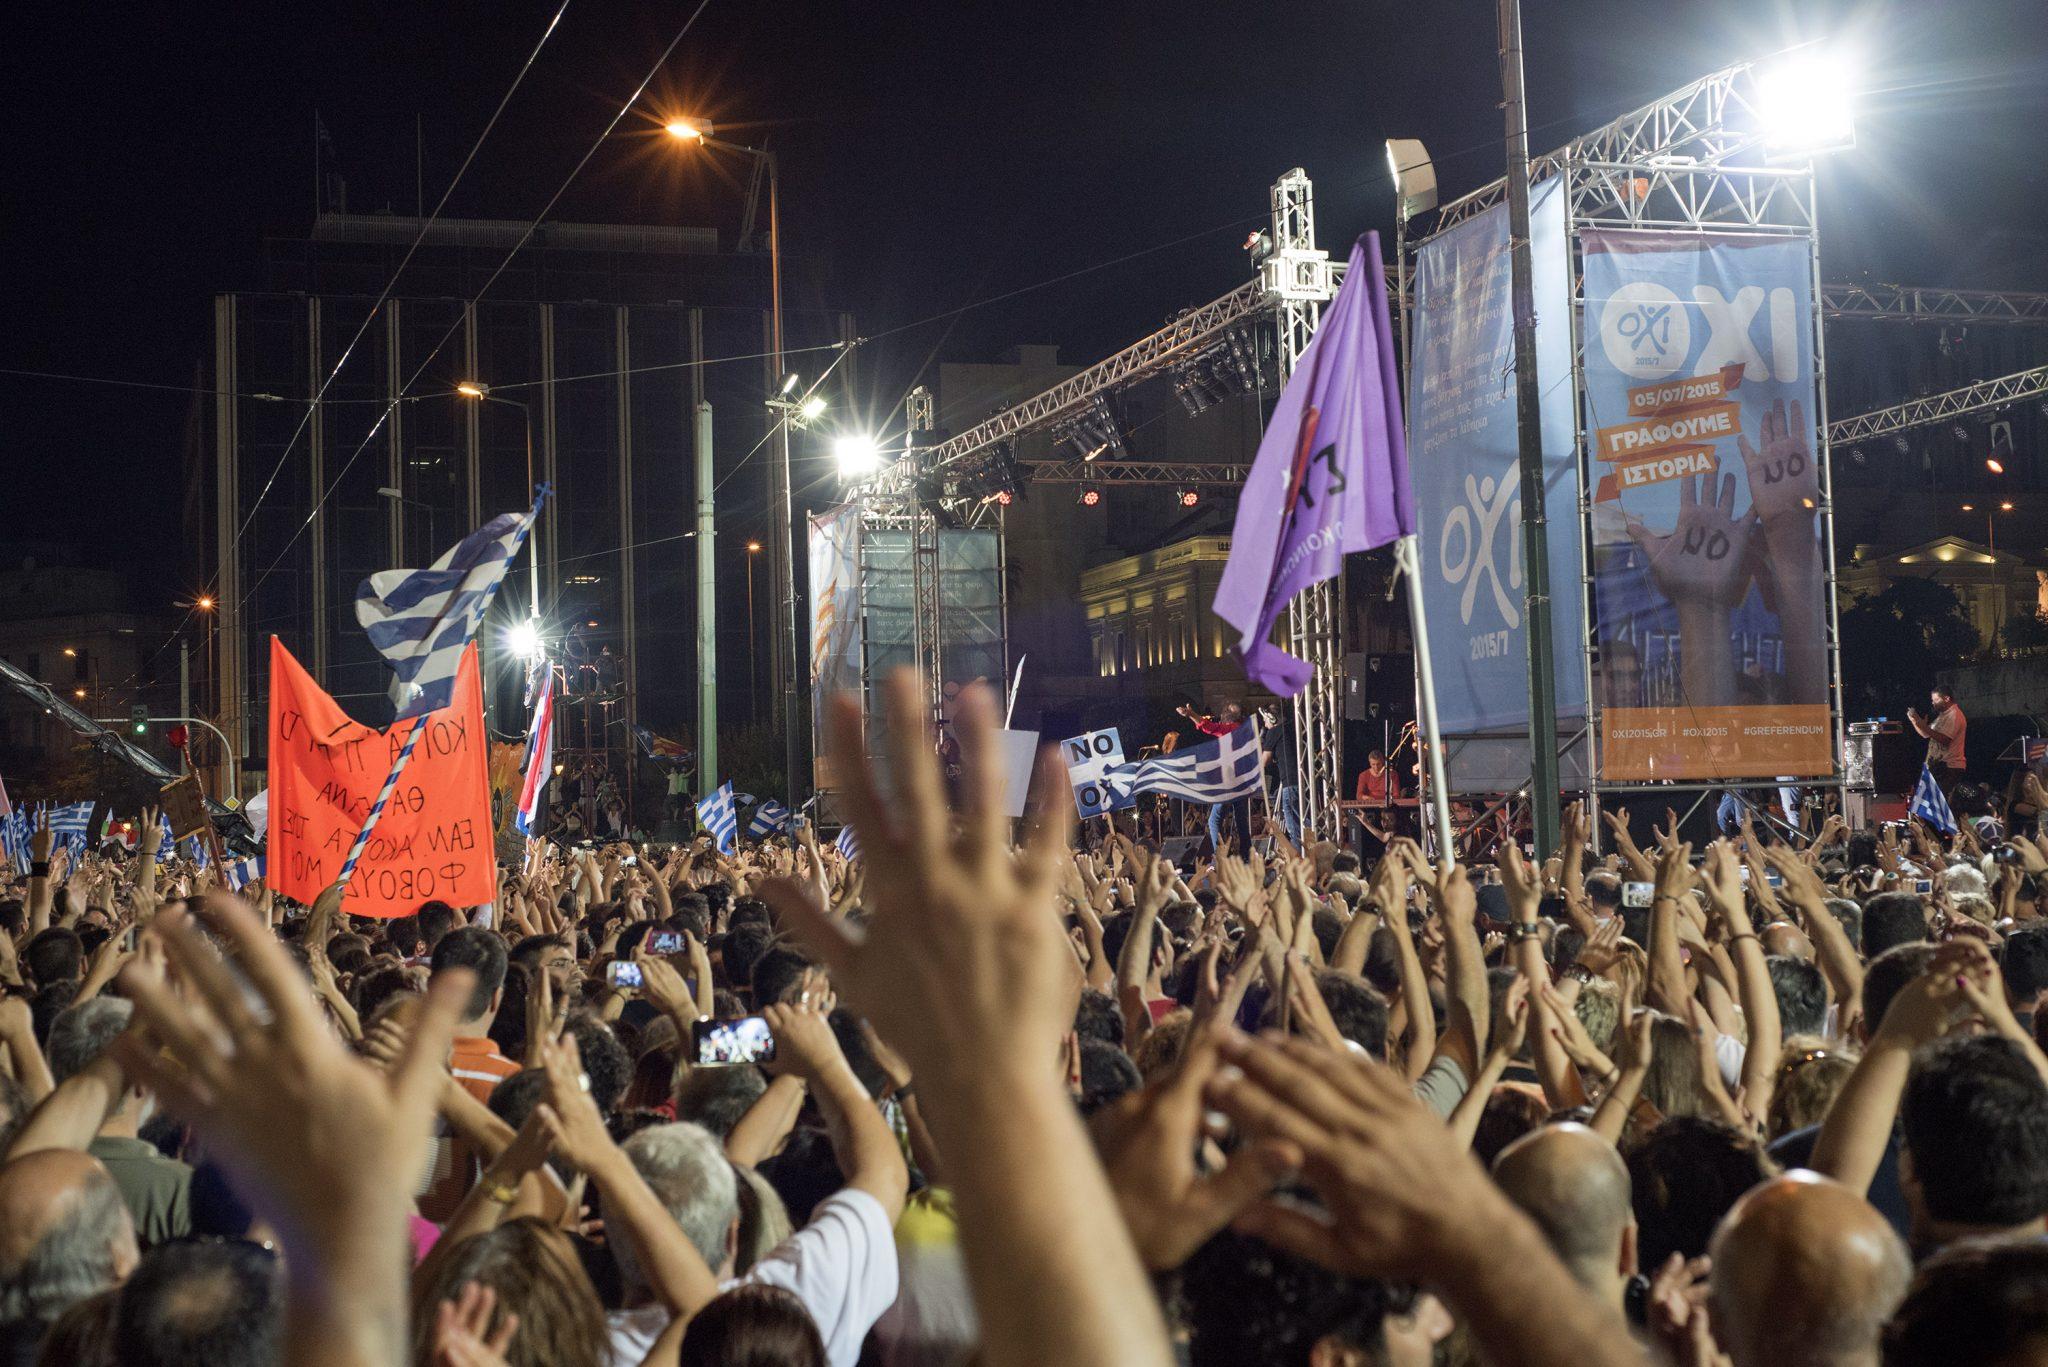 20150703 Greek Referendum Demonstration for NO syntagma square Athens Greece - Brexit, Ceta, Oxi: Historische Momente